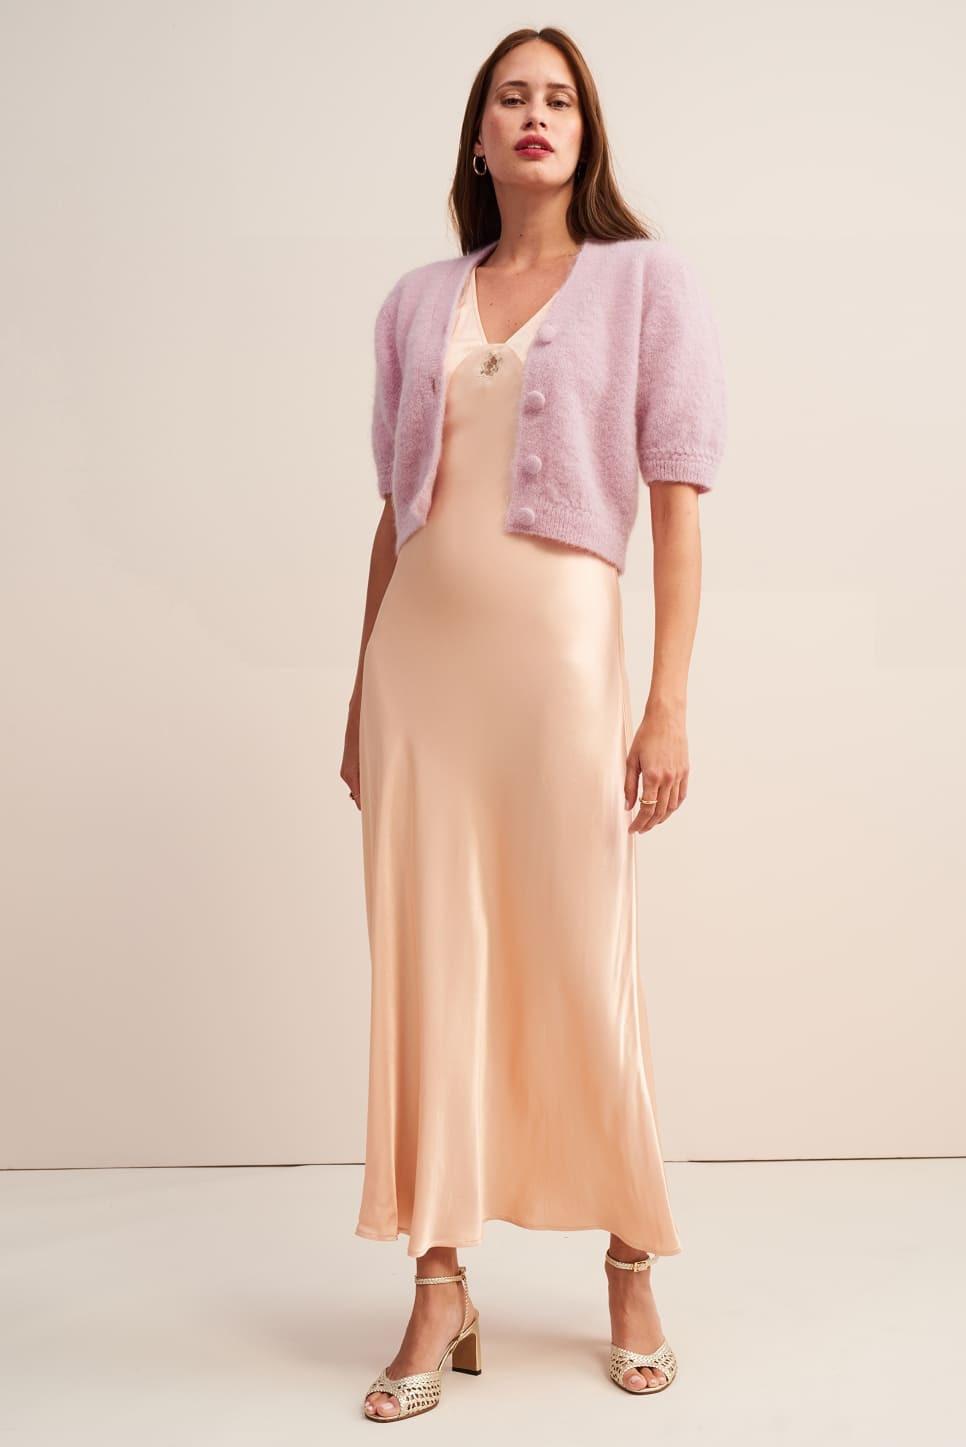 Vestido de Rouje (185 euros).